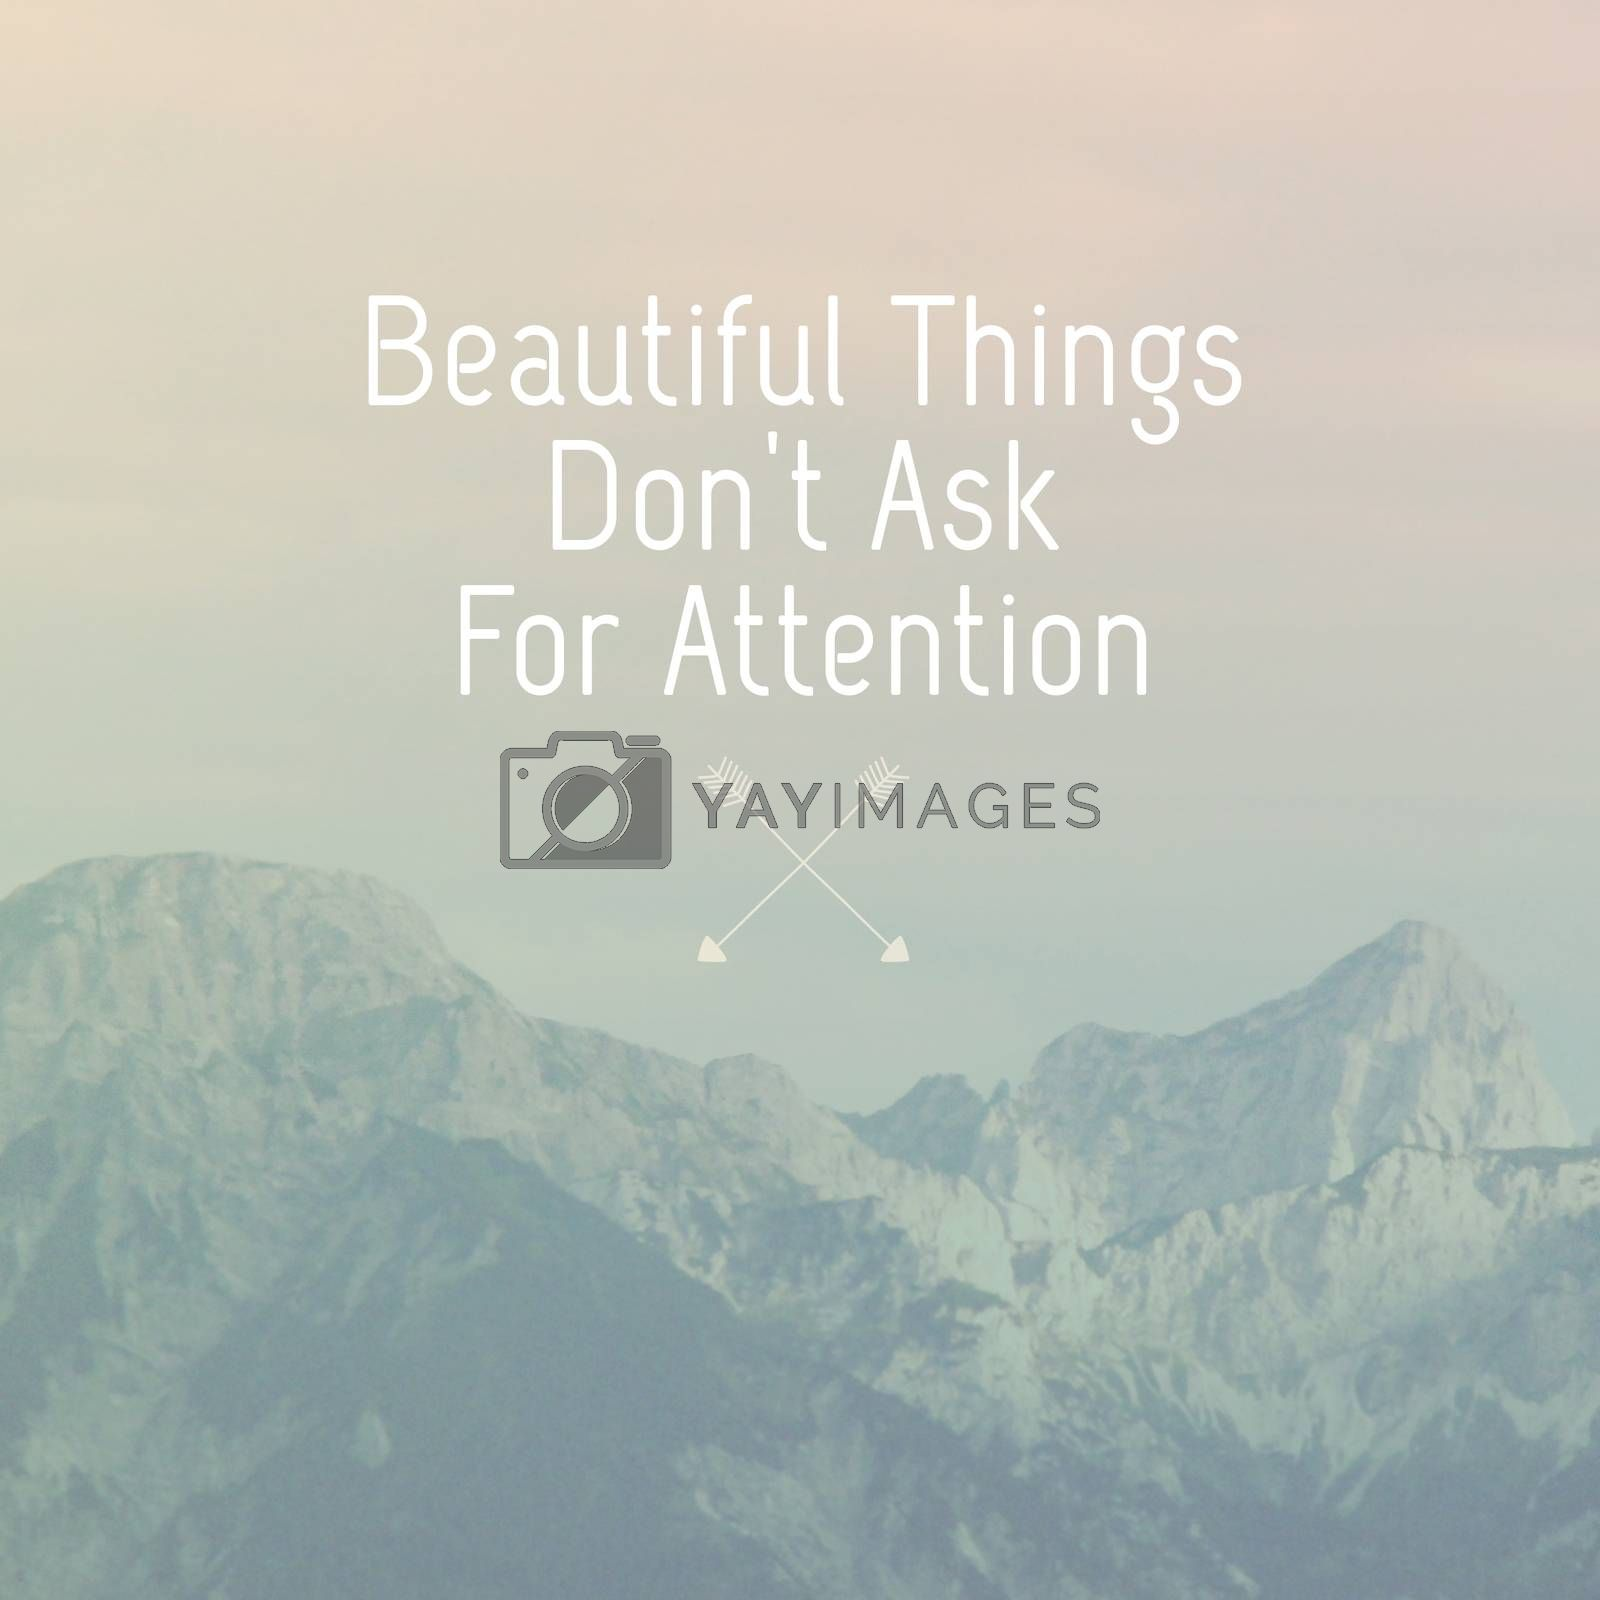 Inspirational motivation quote on natural landscape background